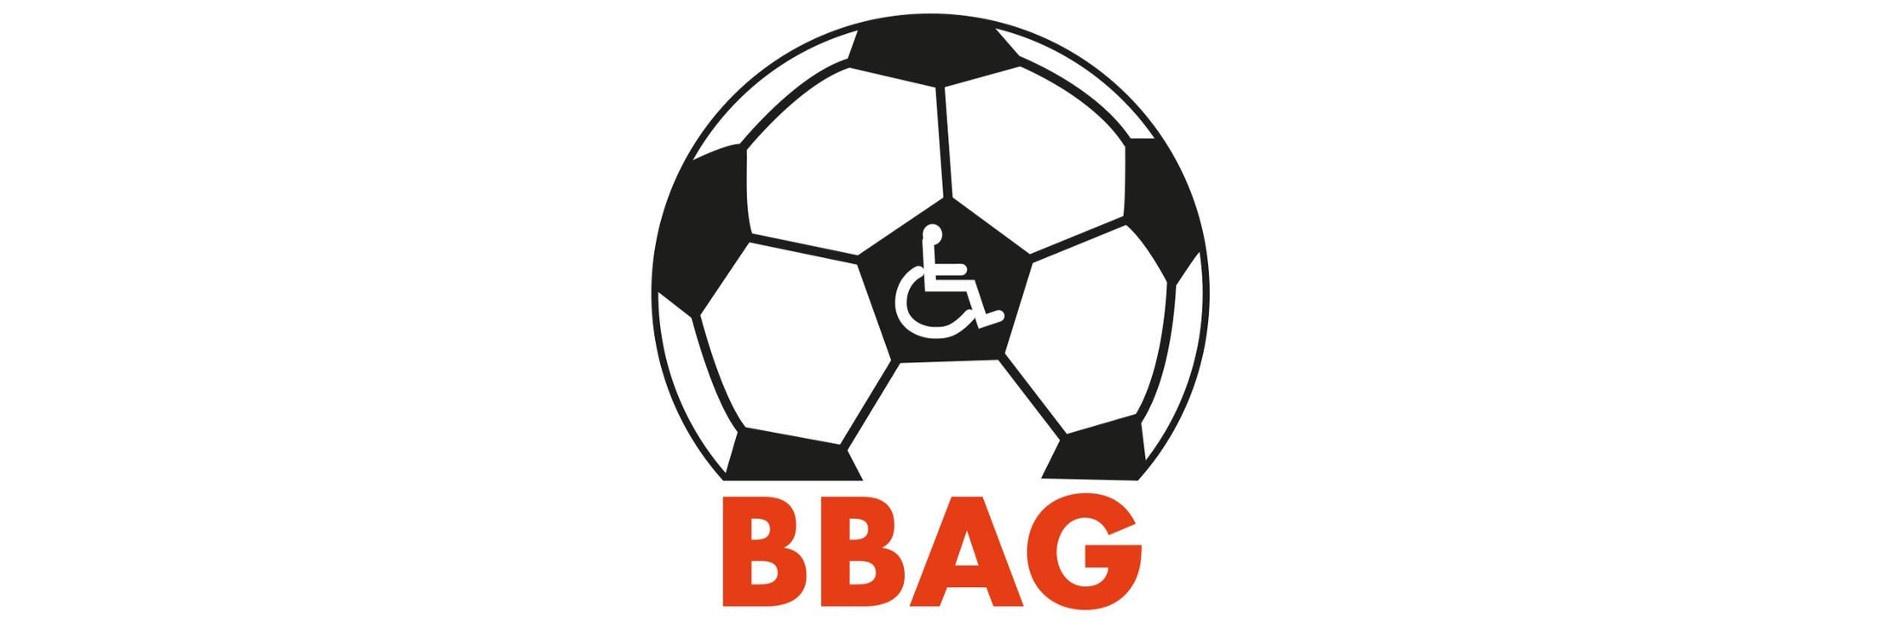 Das Logo der BBAG.